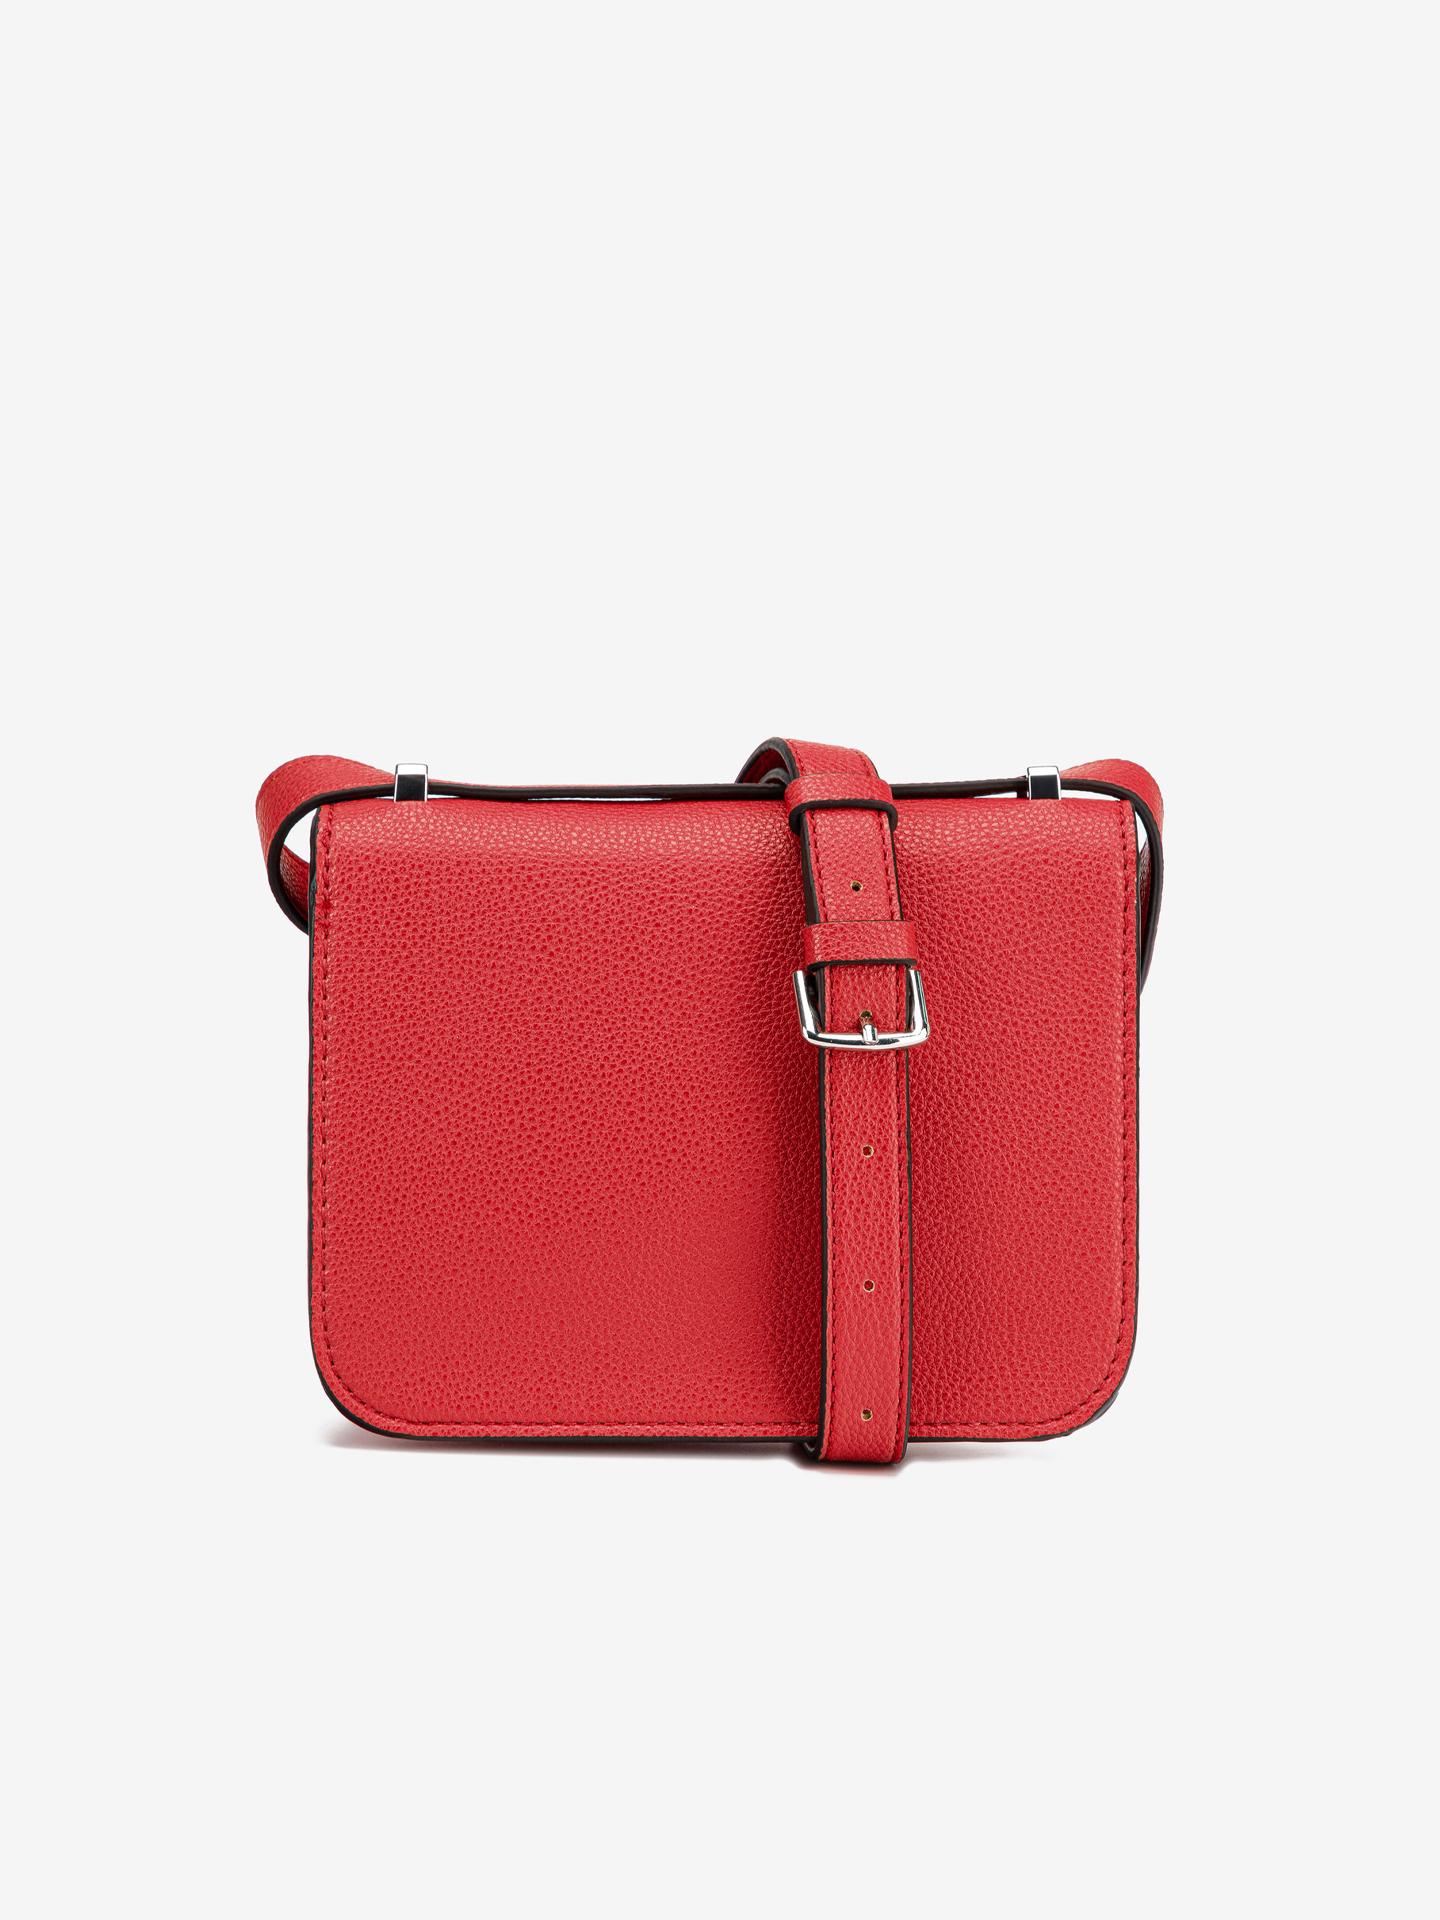 Guess червена crossbody дамска чанта Corily